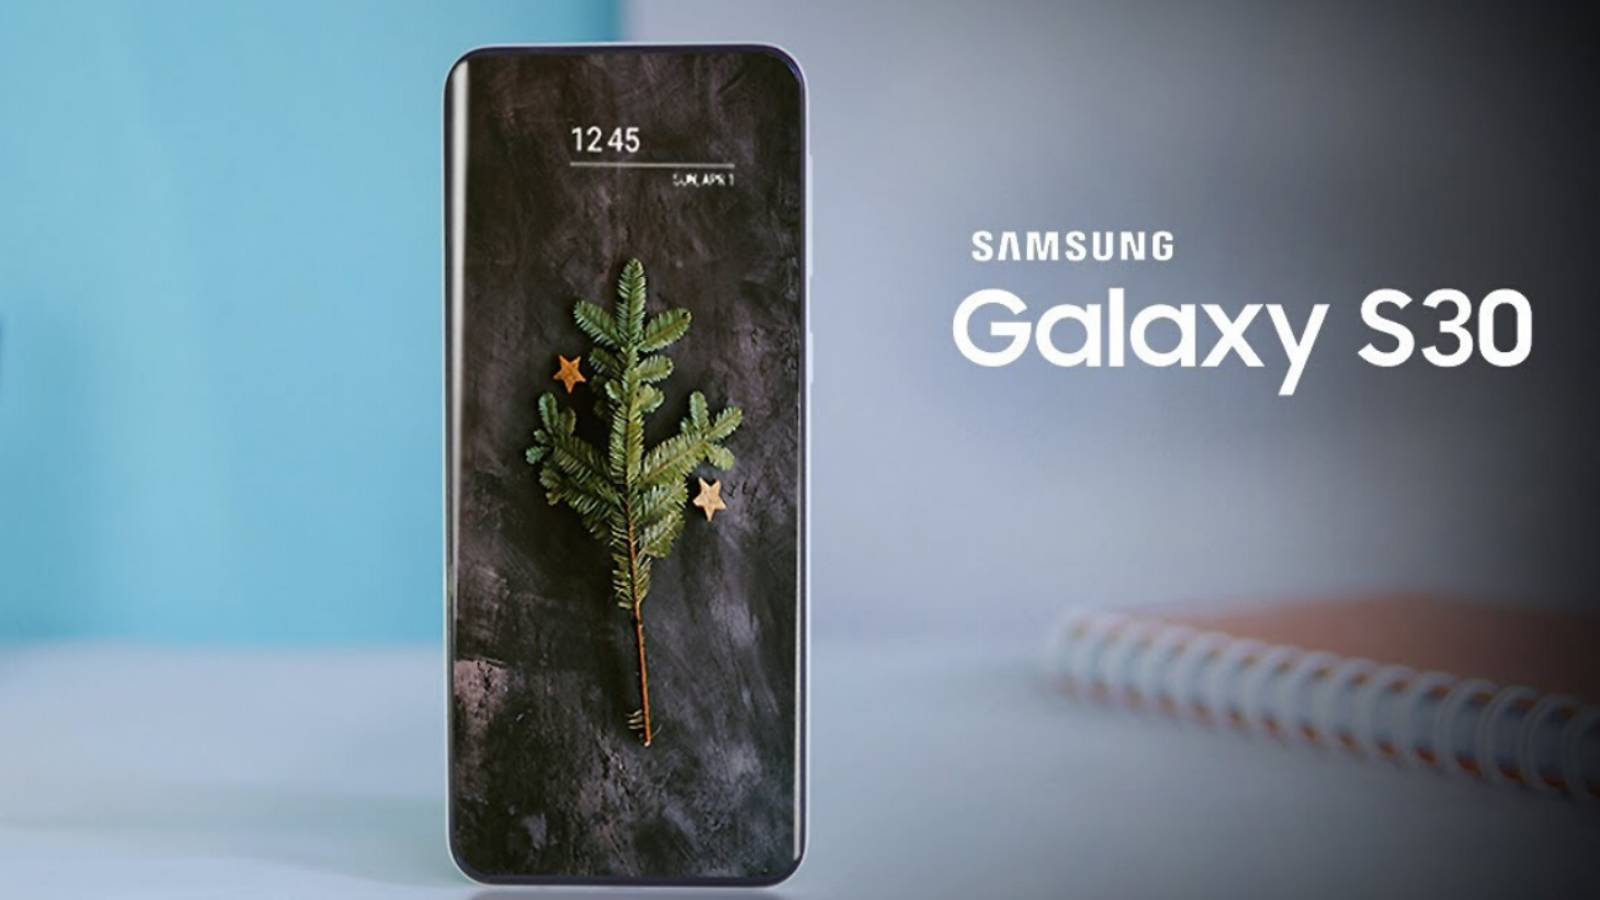 Samsung GALAXY S30 impact